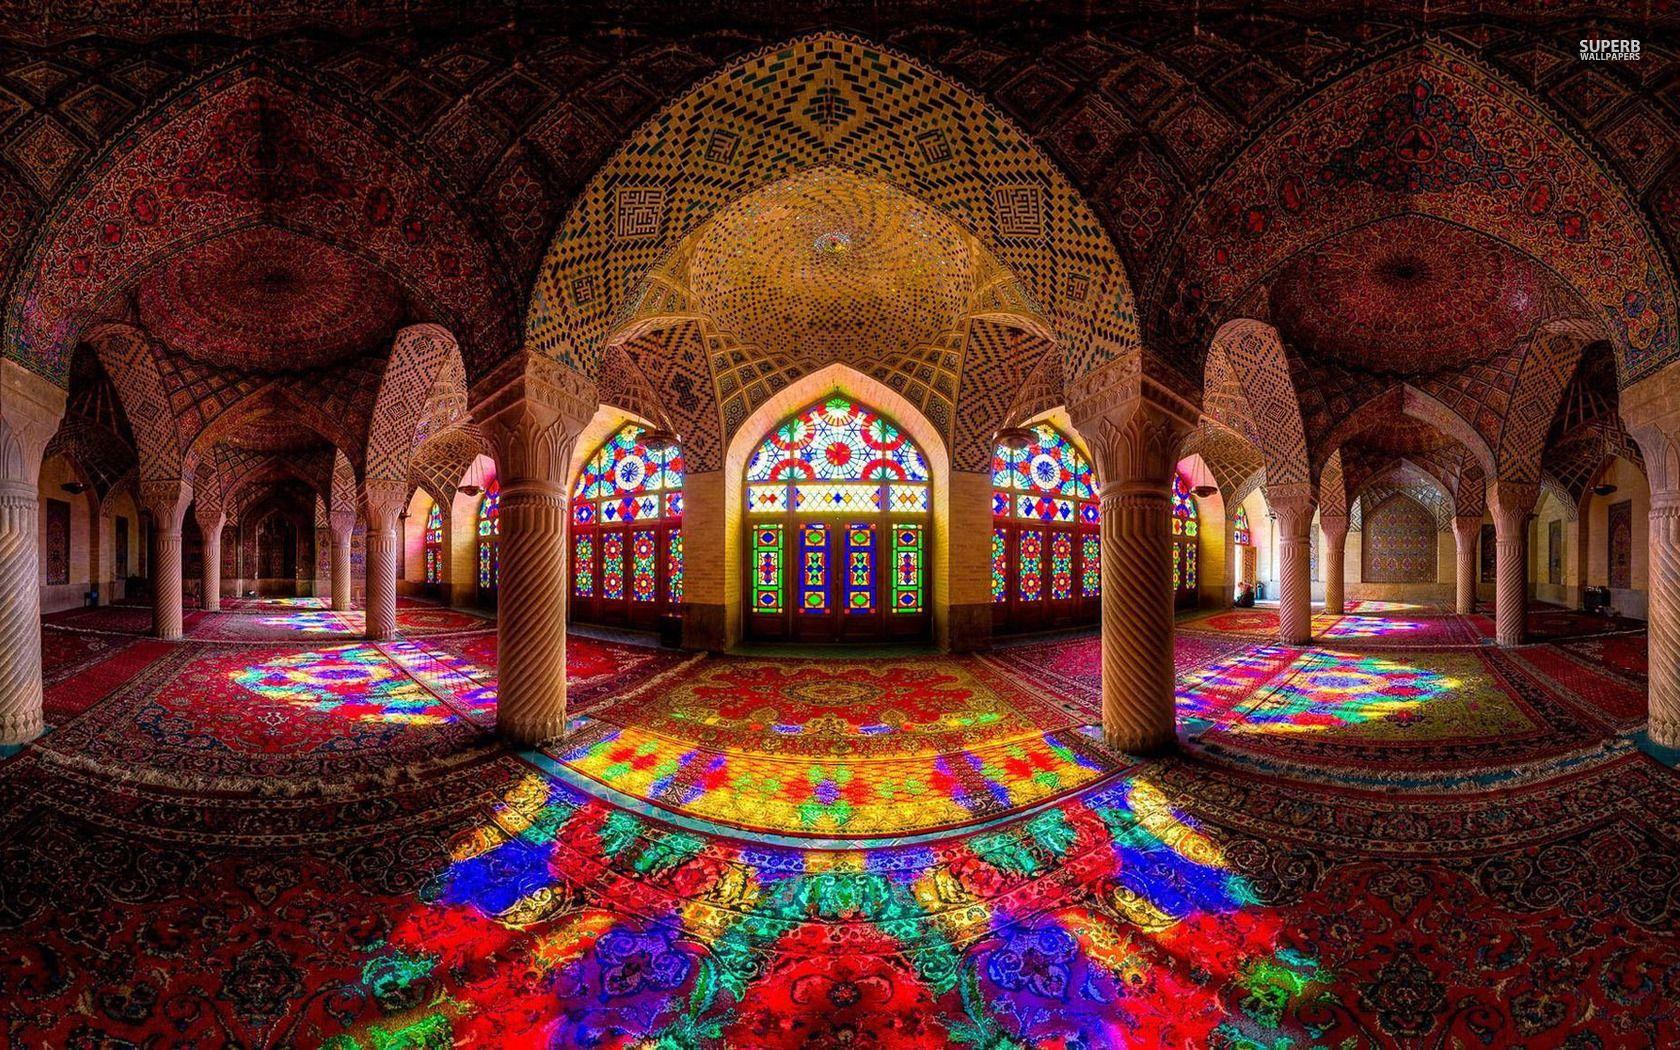 Nasir AlMulk Mosque Rules Nasir AlMulk Mosque Iran Wallpaper - The mesmerising architecture of iranian mosques